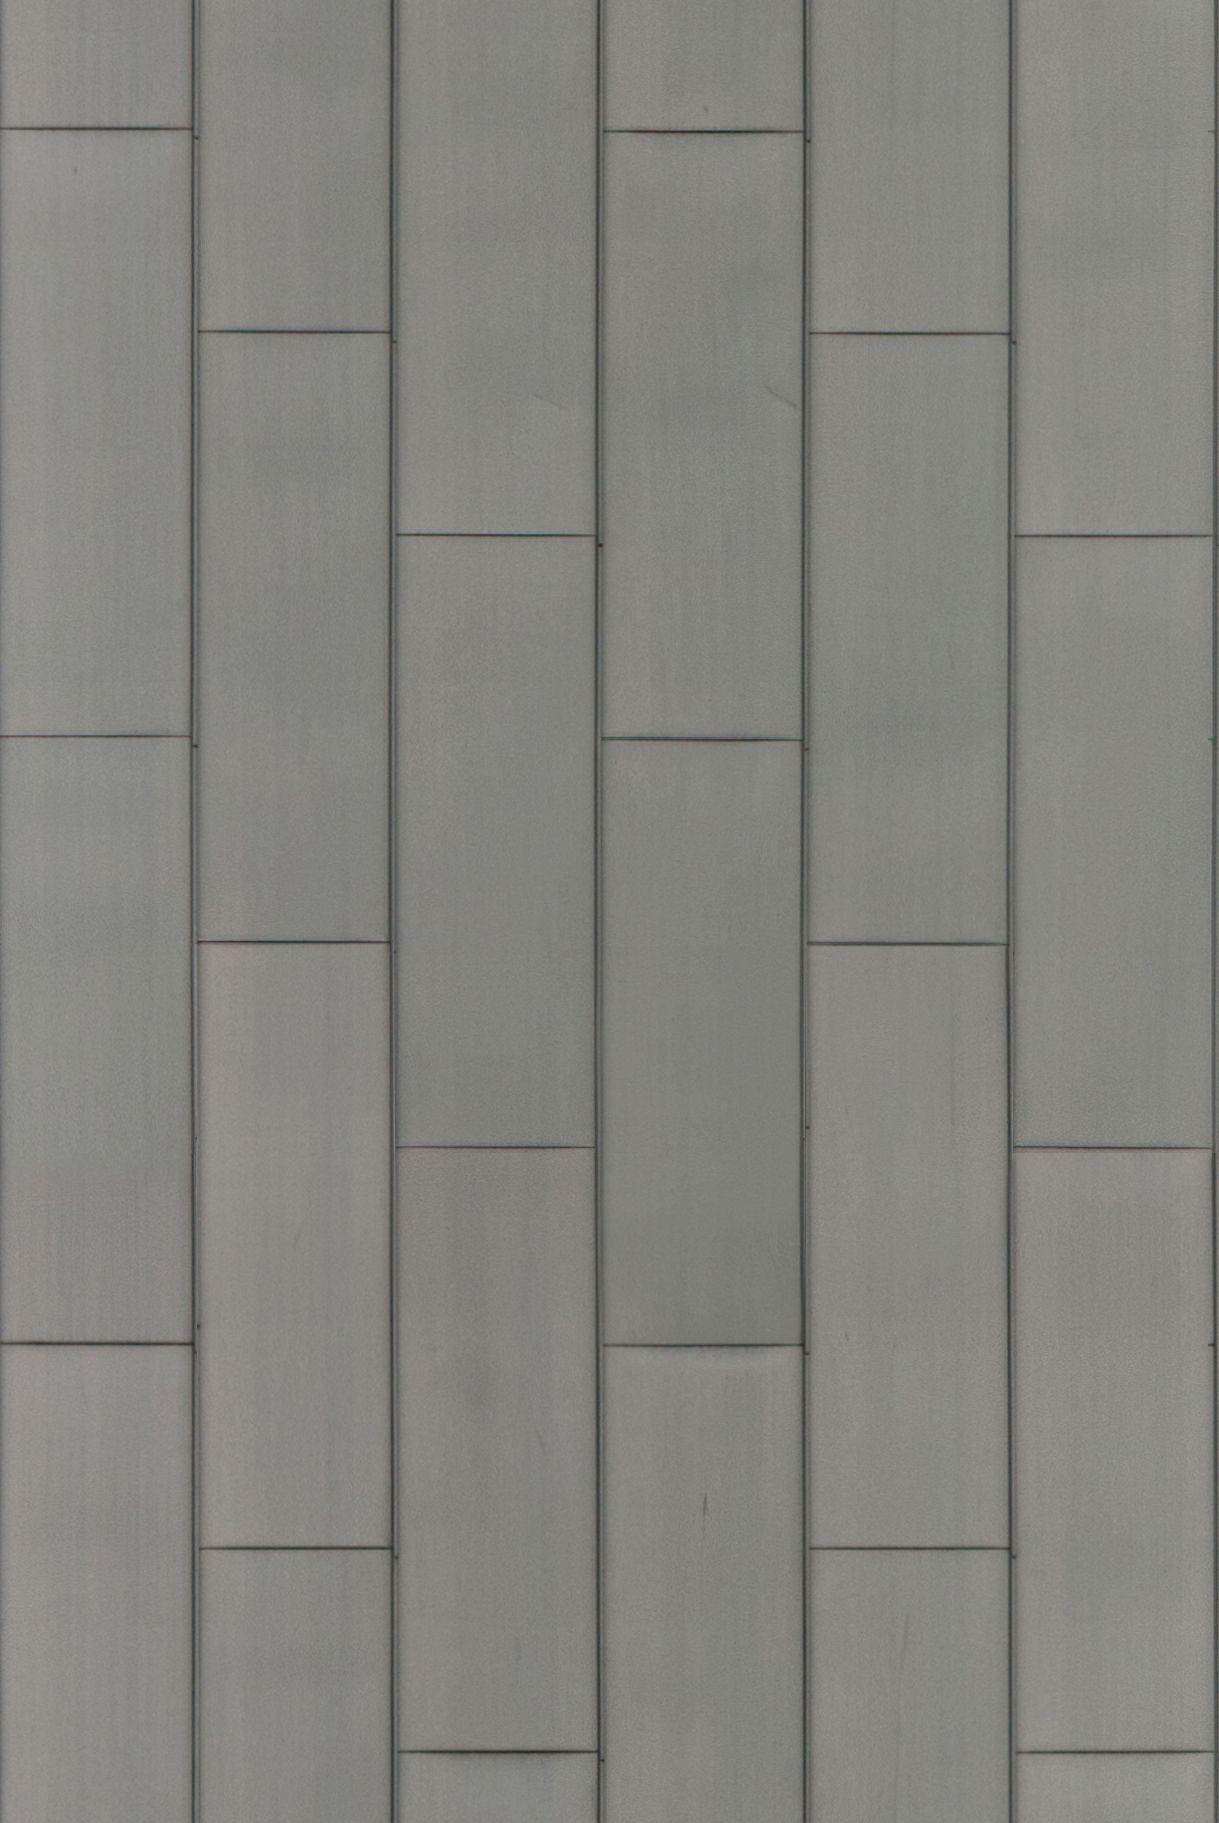 Zinc Standing Seam Architextures Tiles Texture Standing Seam Metal Roof Zinc Roof